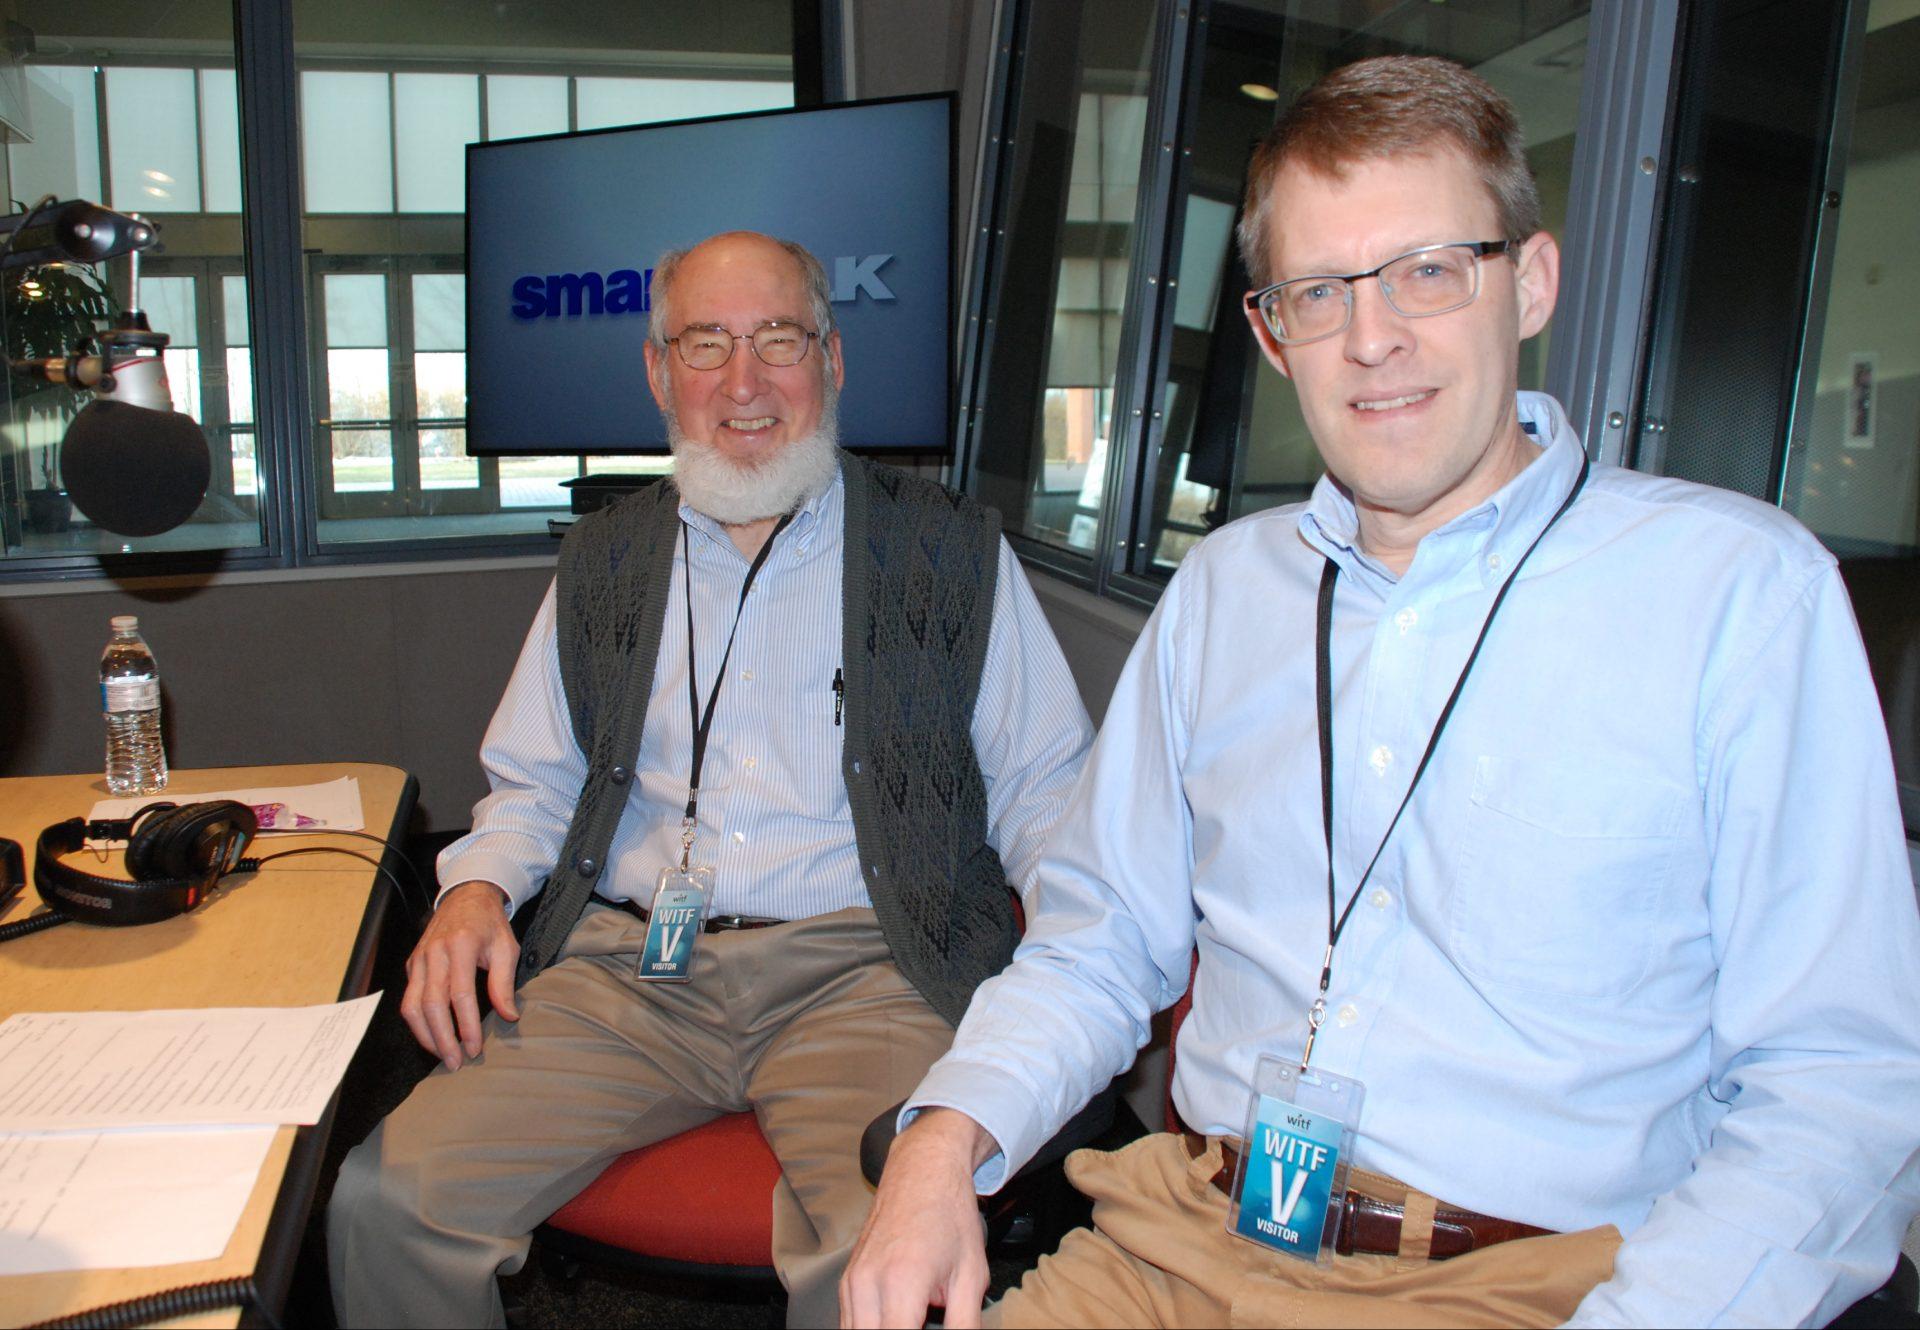 Professor Emeritus Donald Kraybill, Ph.D., and Prof. Steven Nolt, Ph.D., appear on Smart Talk on January 23, 2020.